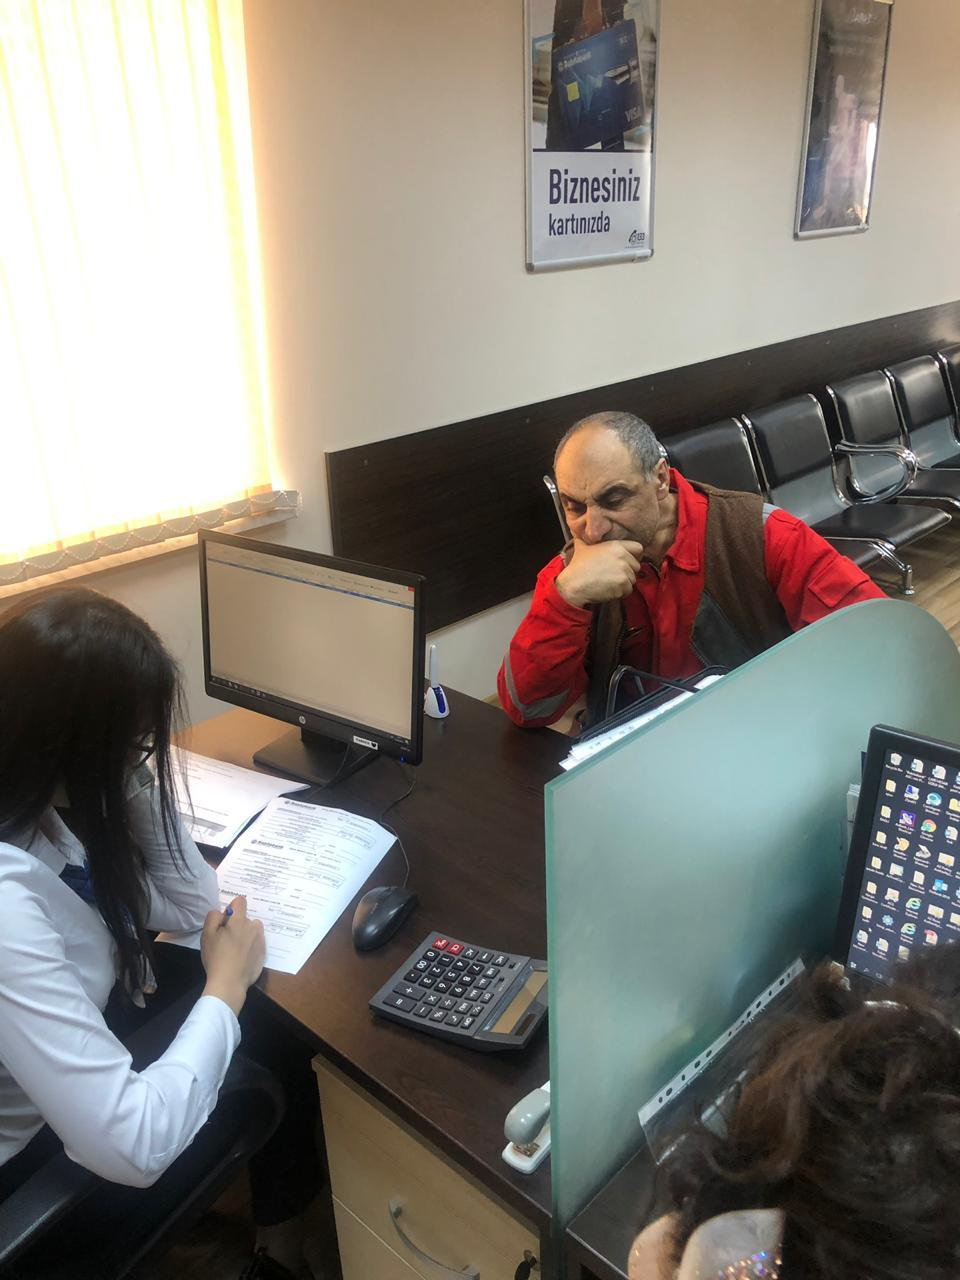 Rabitabank выдал первую компенсацию! (ФОТО) - Gallery Image